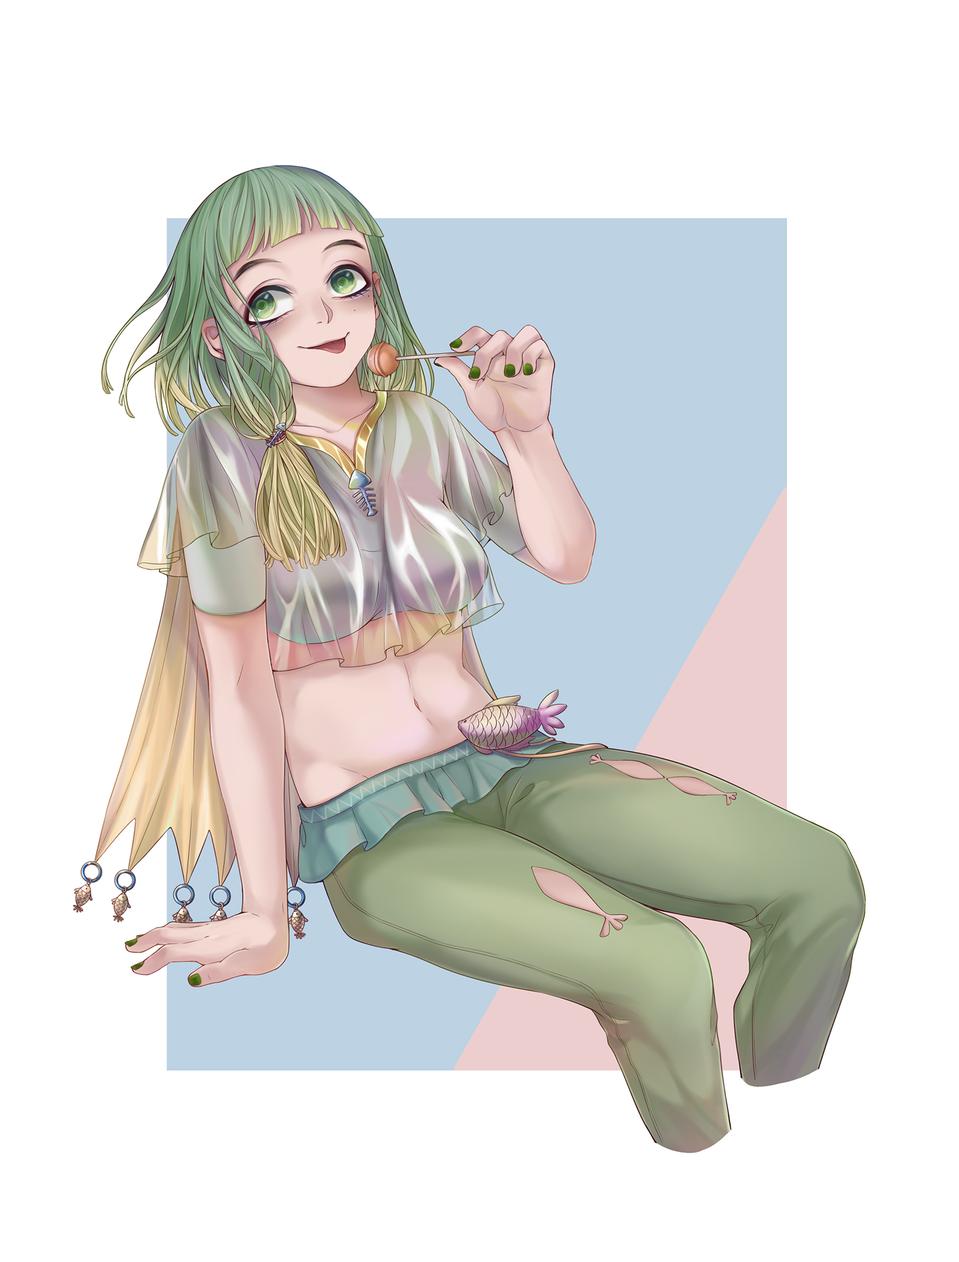 少女2 Illust of 君59 ARTstreet_Ranking girl 坐姿